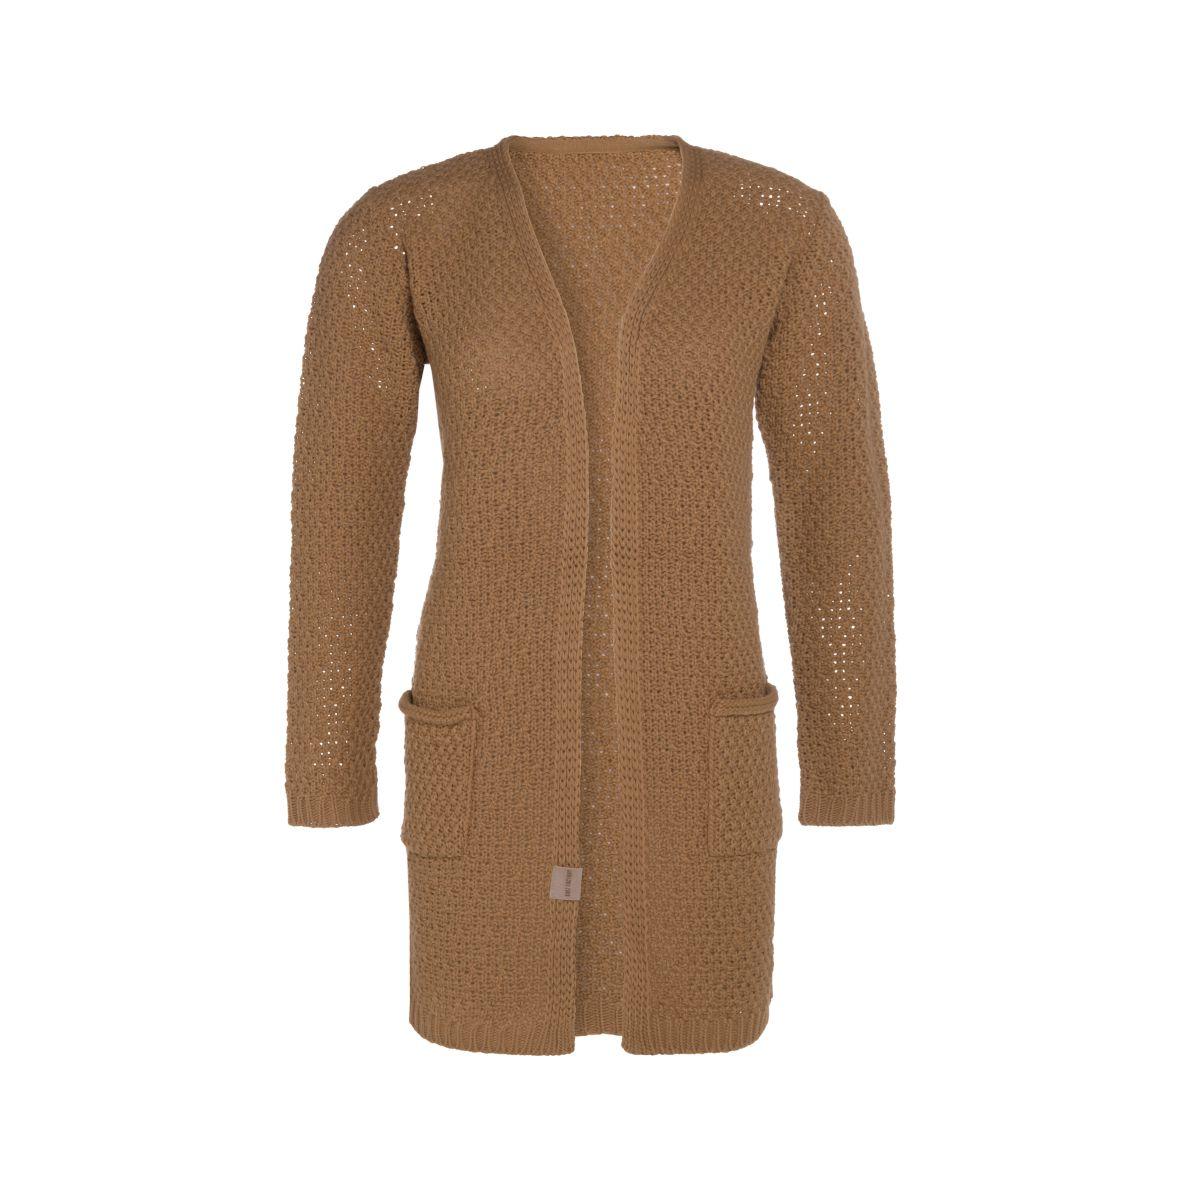 knit factory kf13308102051 luna vest new camel 4042 1